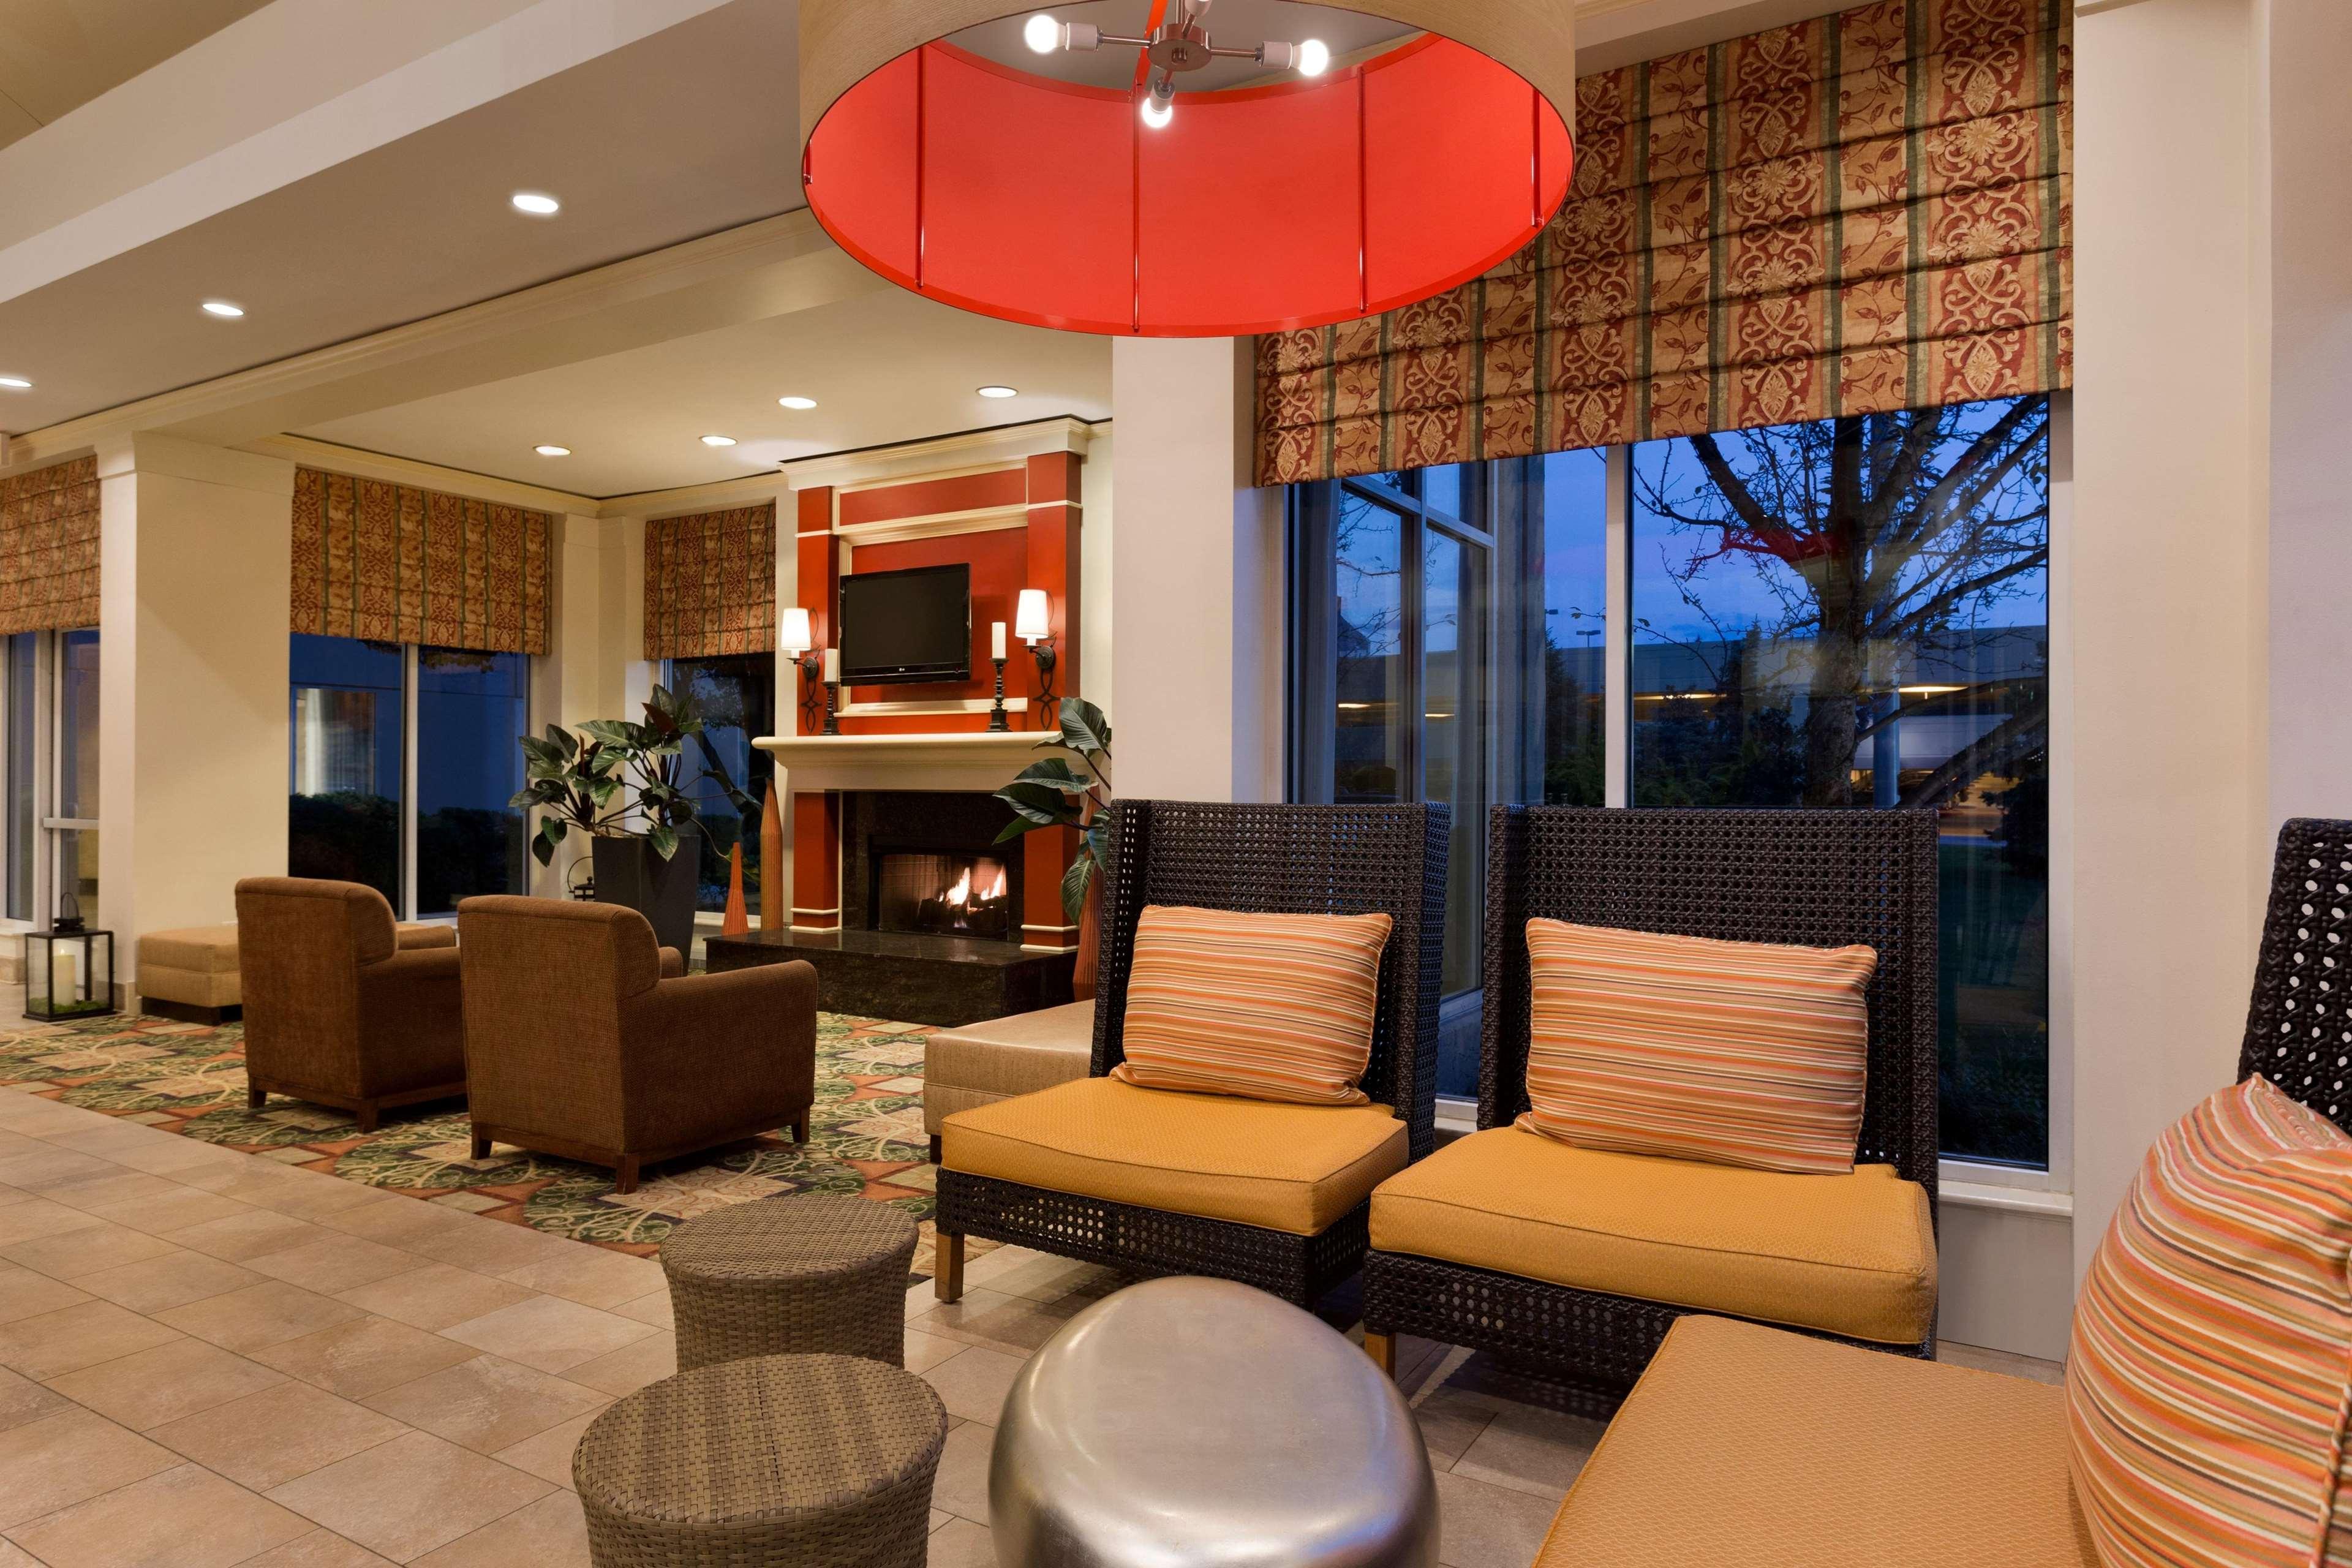 Hilton Garden Inn Chicago/Oakbrook Terrace image 14